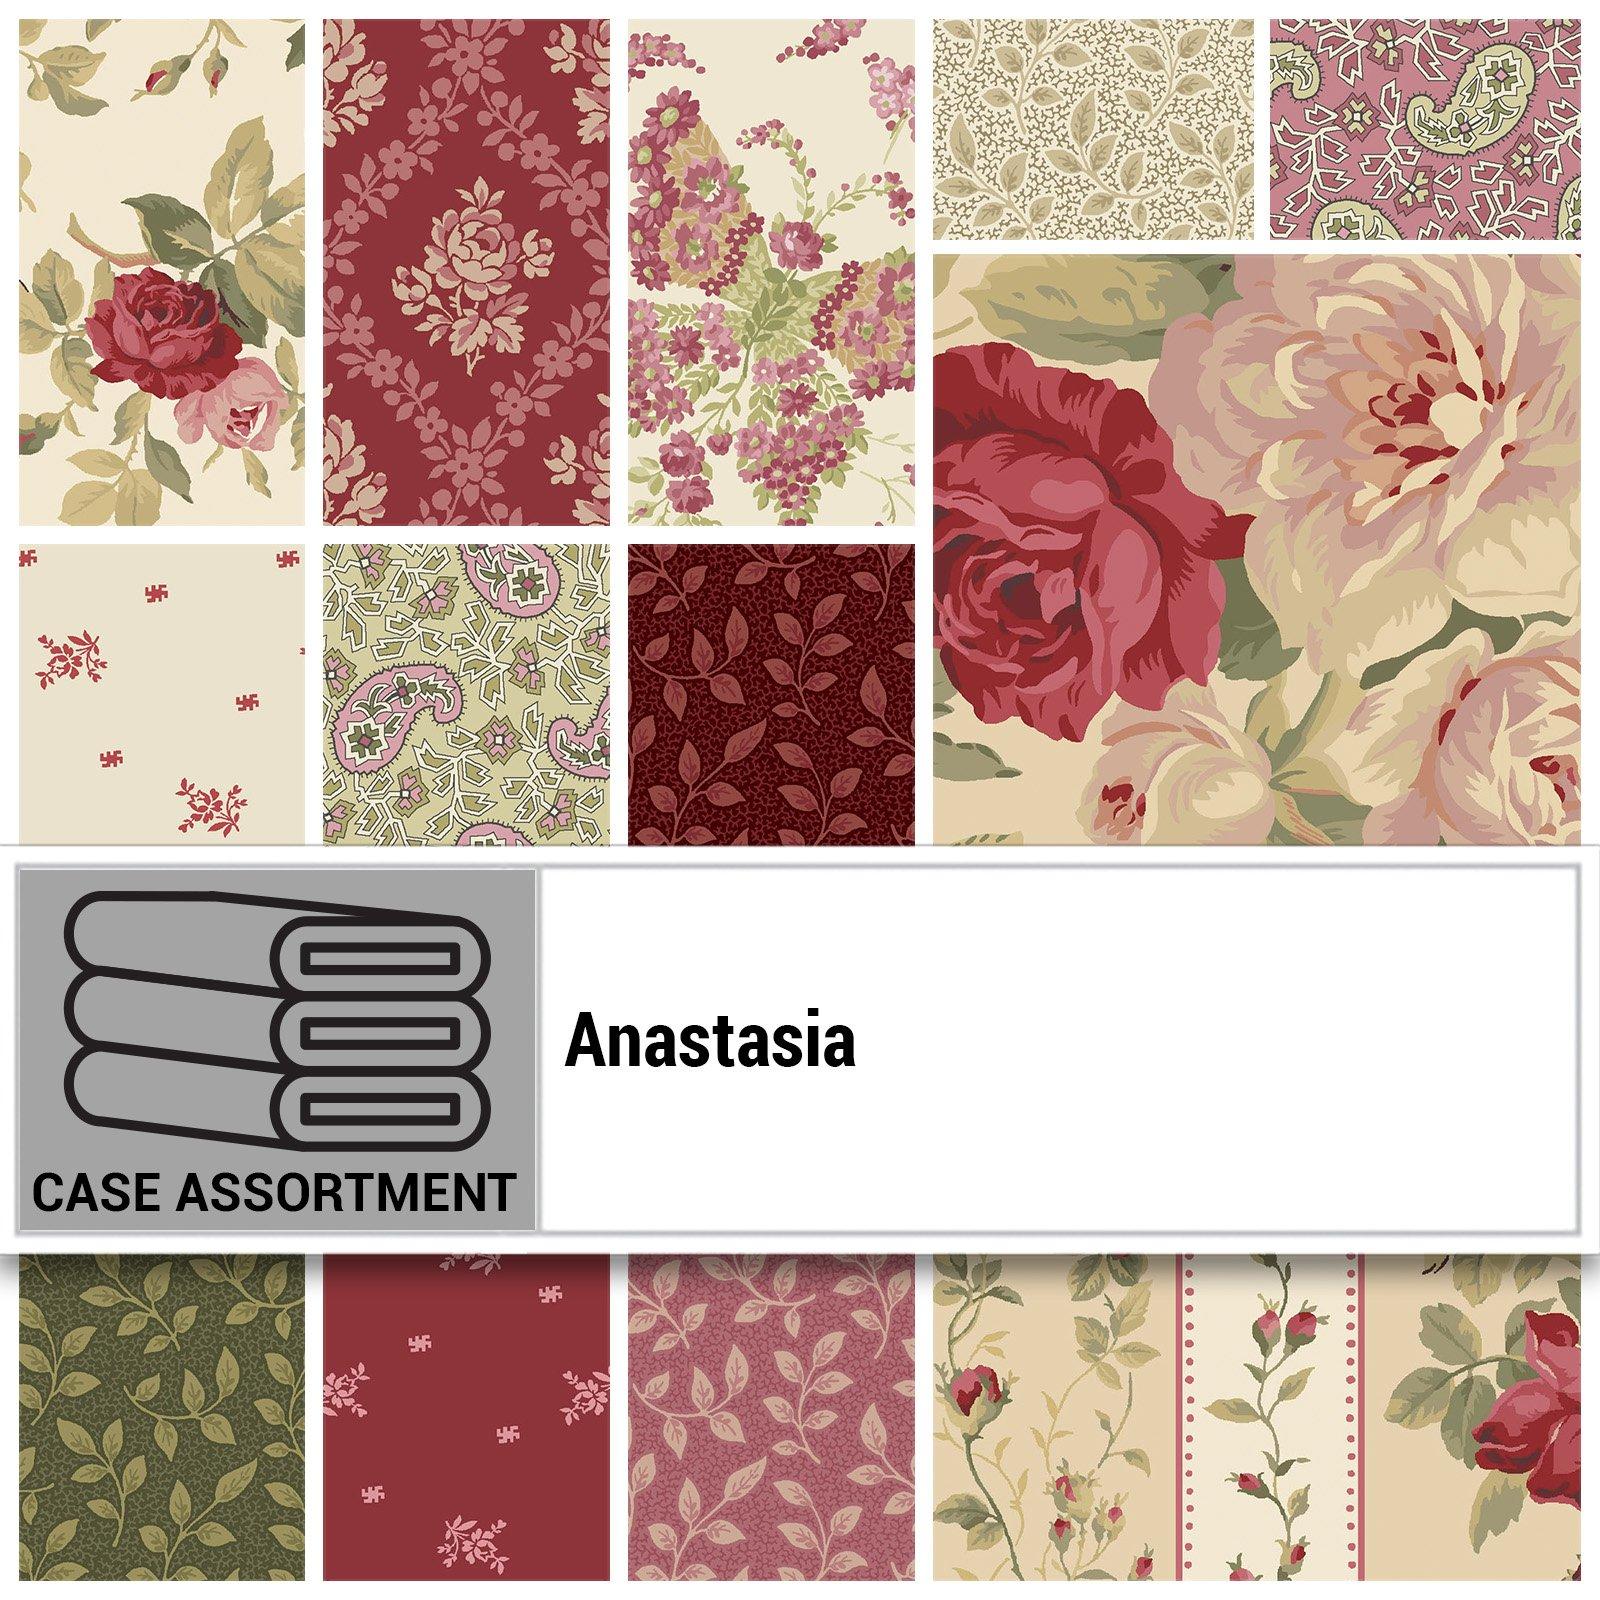 CSMD-CPFB ANAS - ANASTASIA - RED CASE PACK FULL BOLT X 15PCS